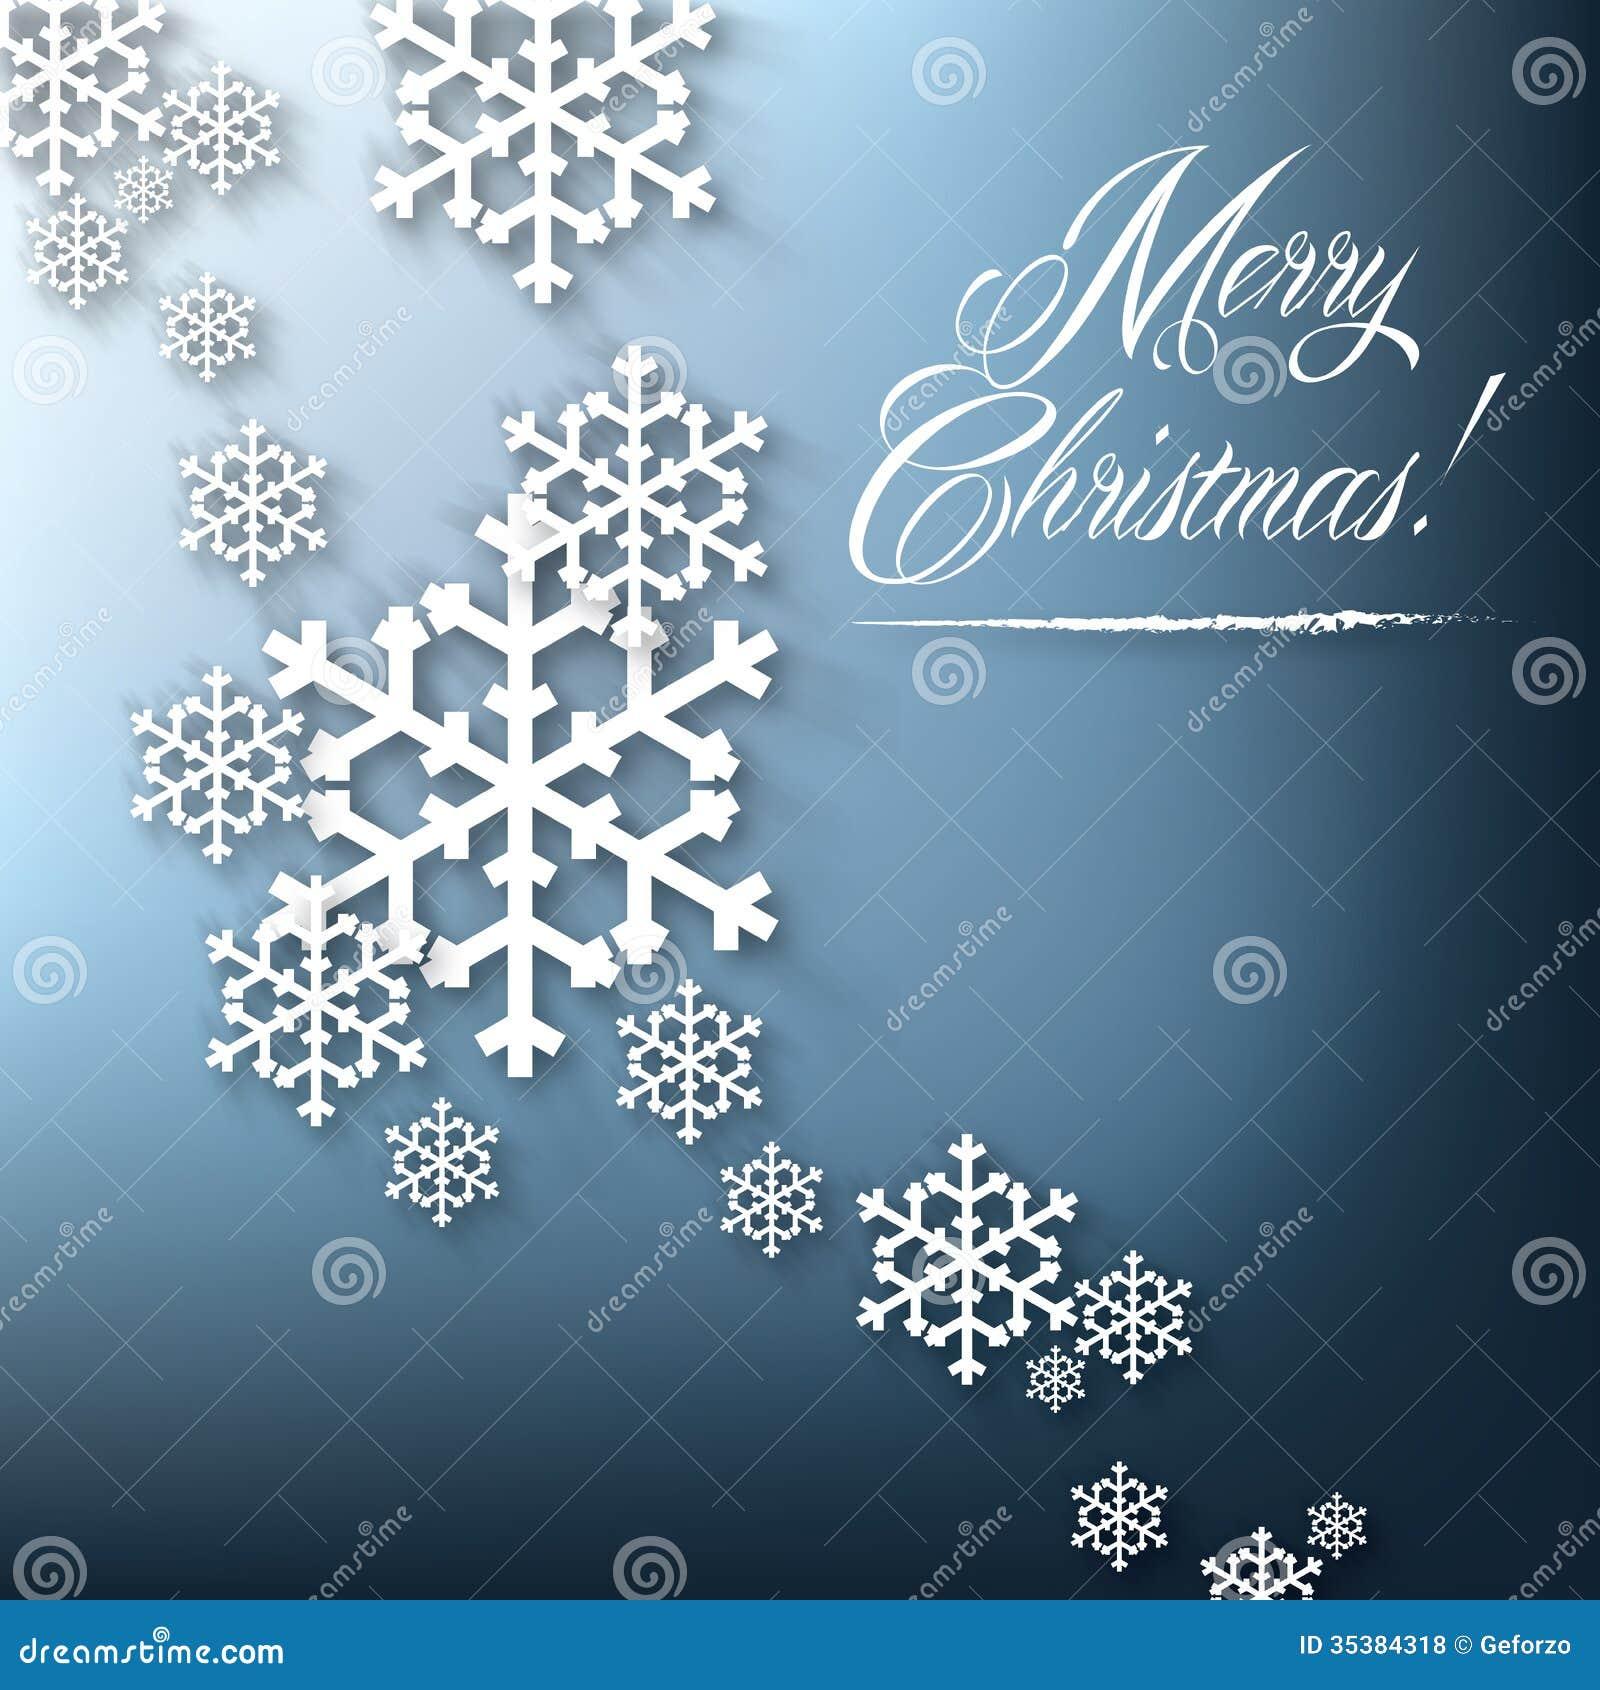 Merry Christmas Card Royalty Free Stock Photos Image